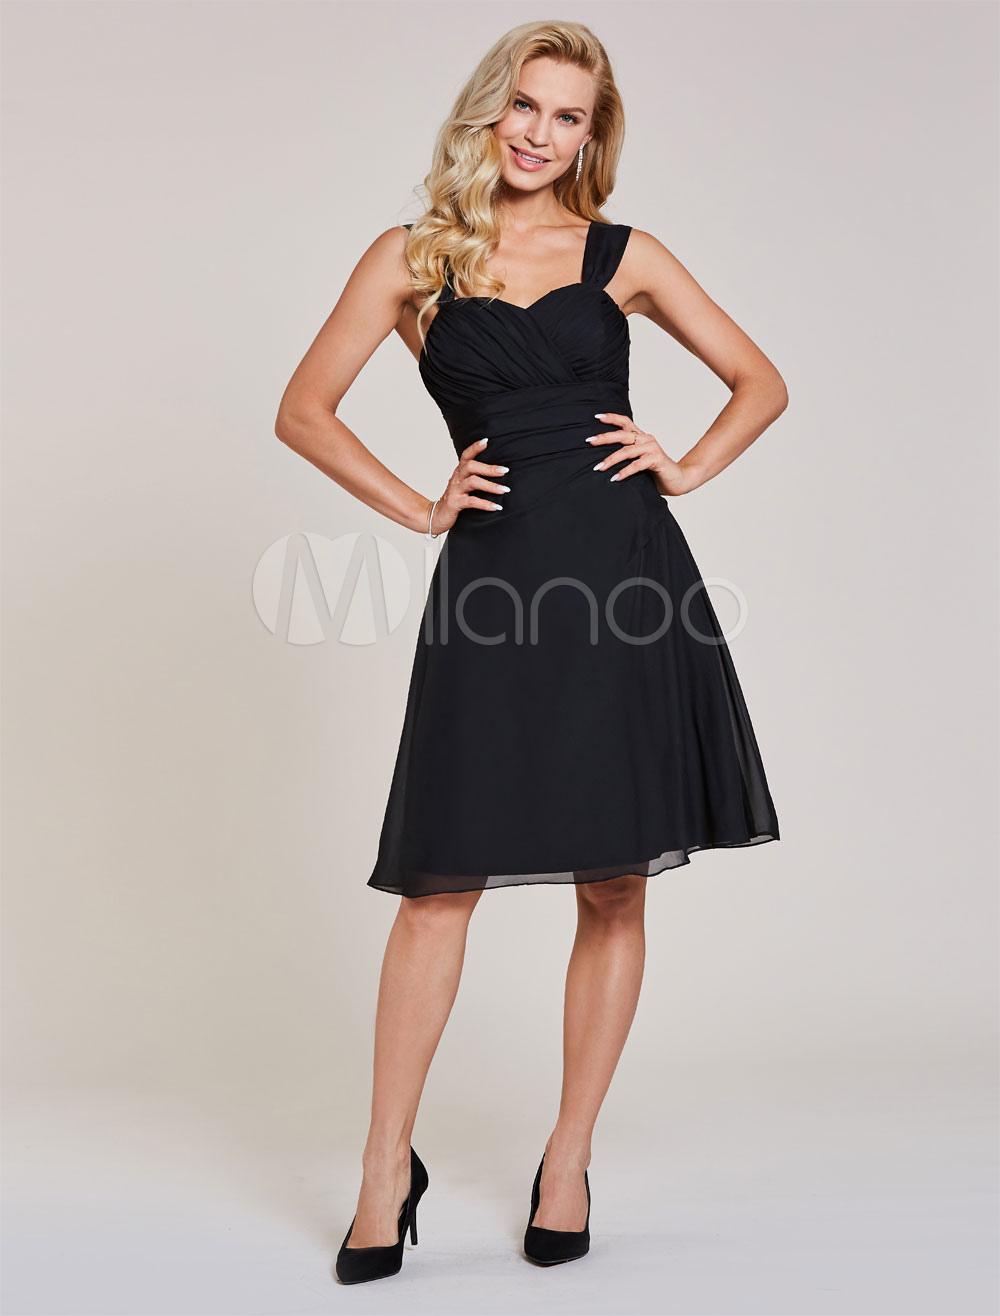 Little Black Dresses Straps Pleated Short Cocktail Dress Chiffon Knee Length Graduation Dress